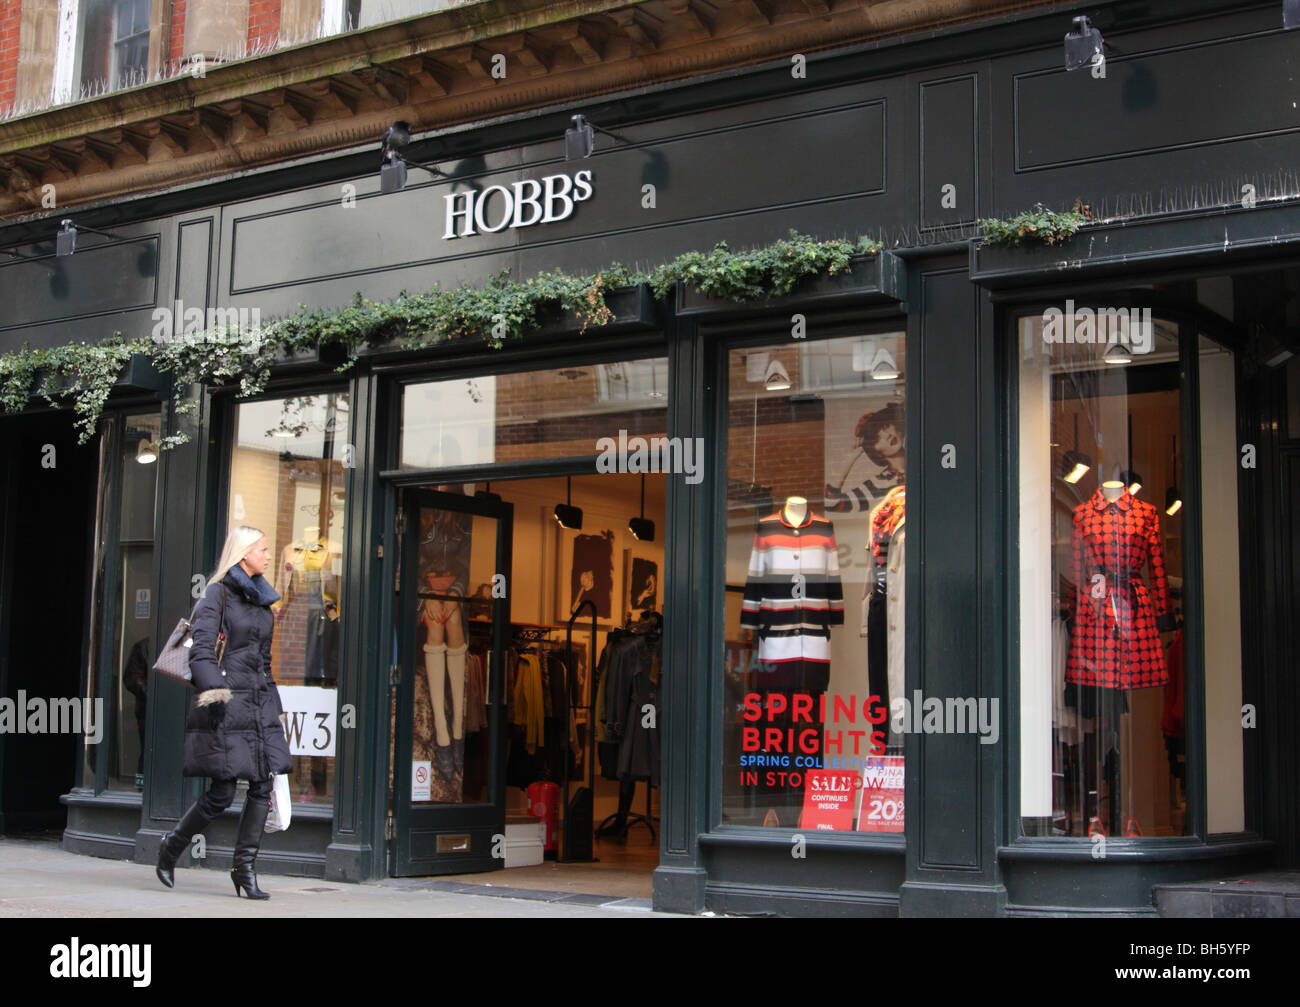 c9768c8eab97 Hobbs Fashion Store Uk Stock Photos & Hobbs Fashion Store Uk Stock ...